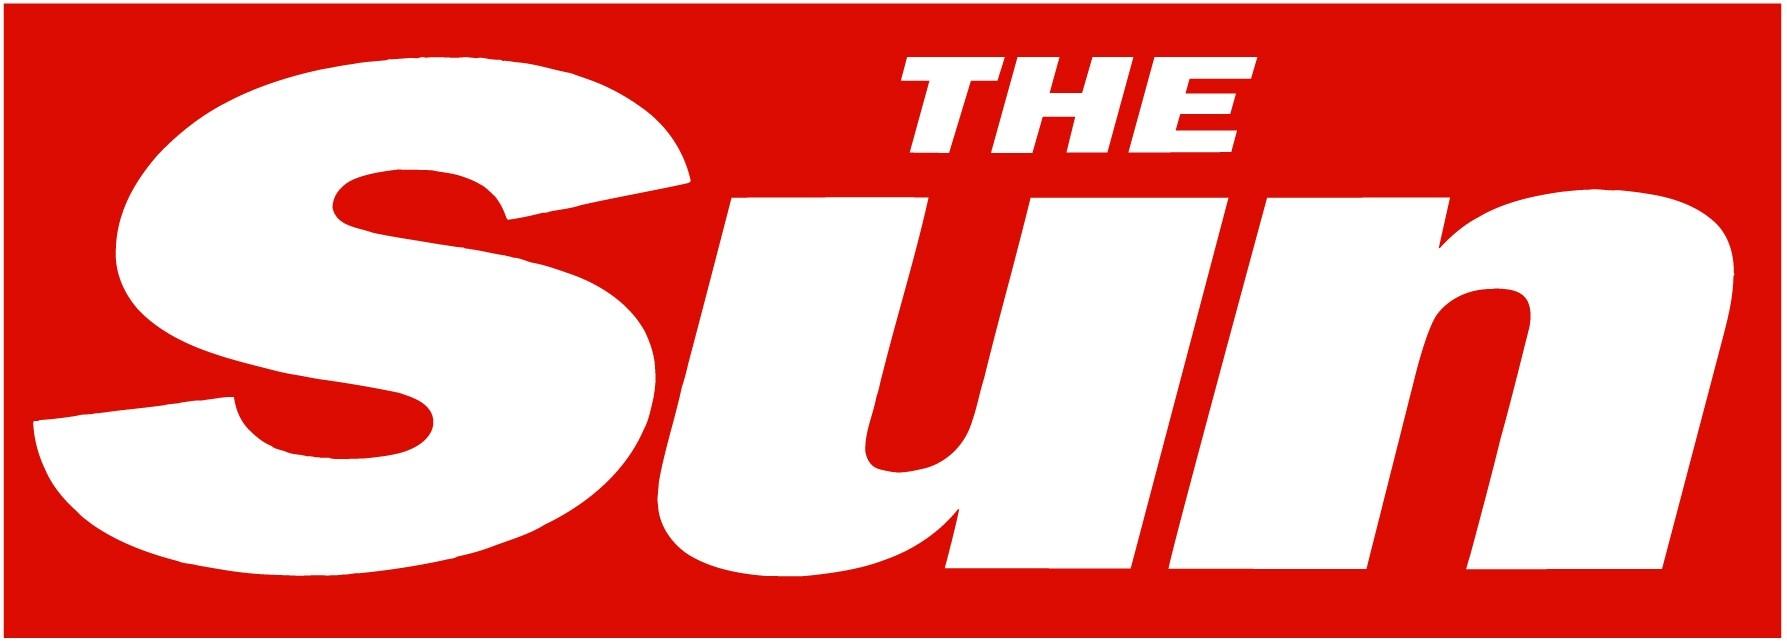 The-Sun-logo-1-13.jpg